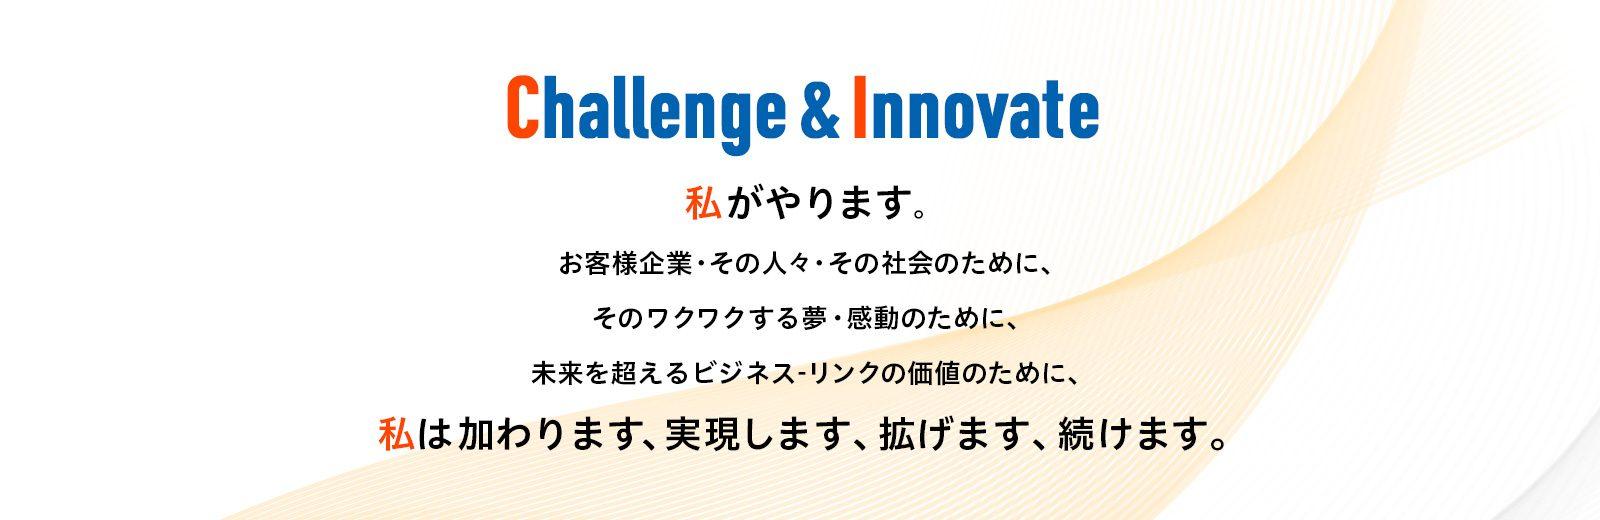 Challenge & Innovative